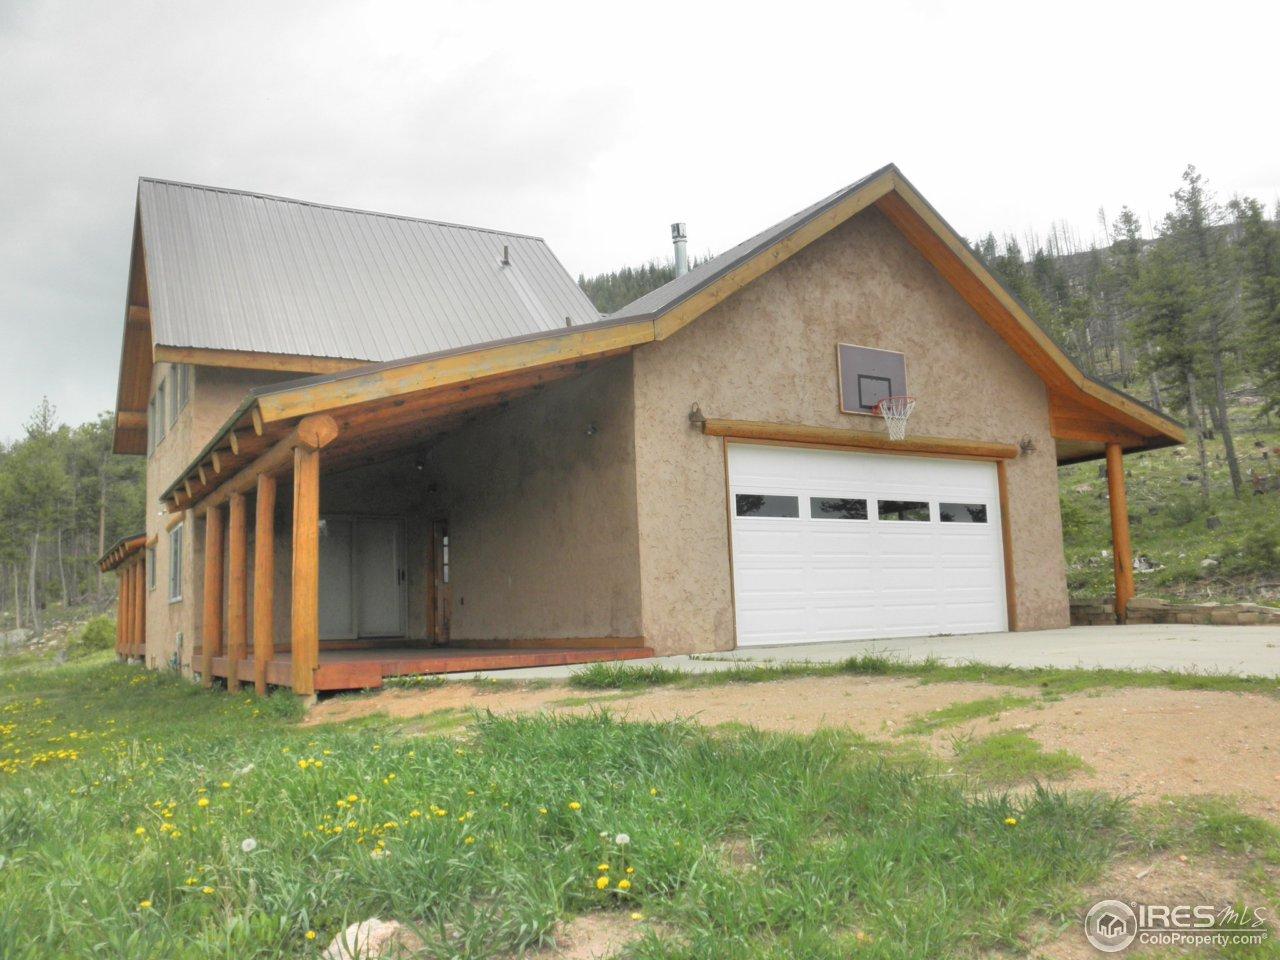 700 Woodlot Ln, Bellvue, CO 80512